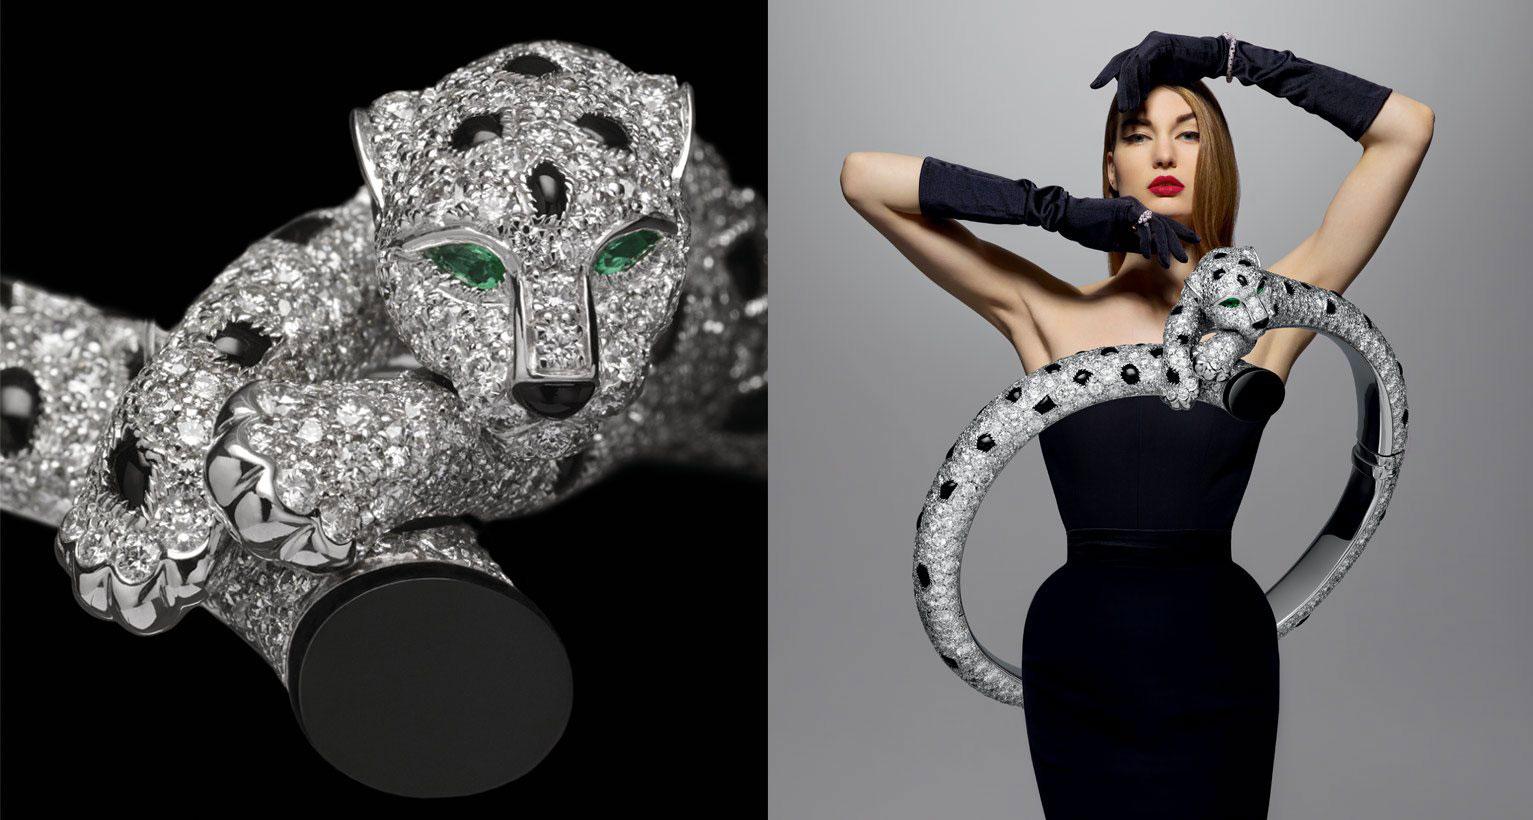 Bracelet in white gold, emeralds, onyx and diamonds